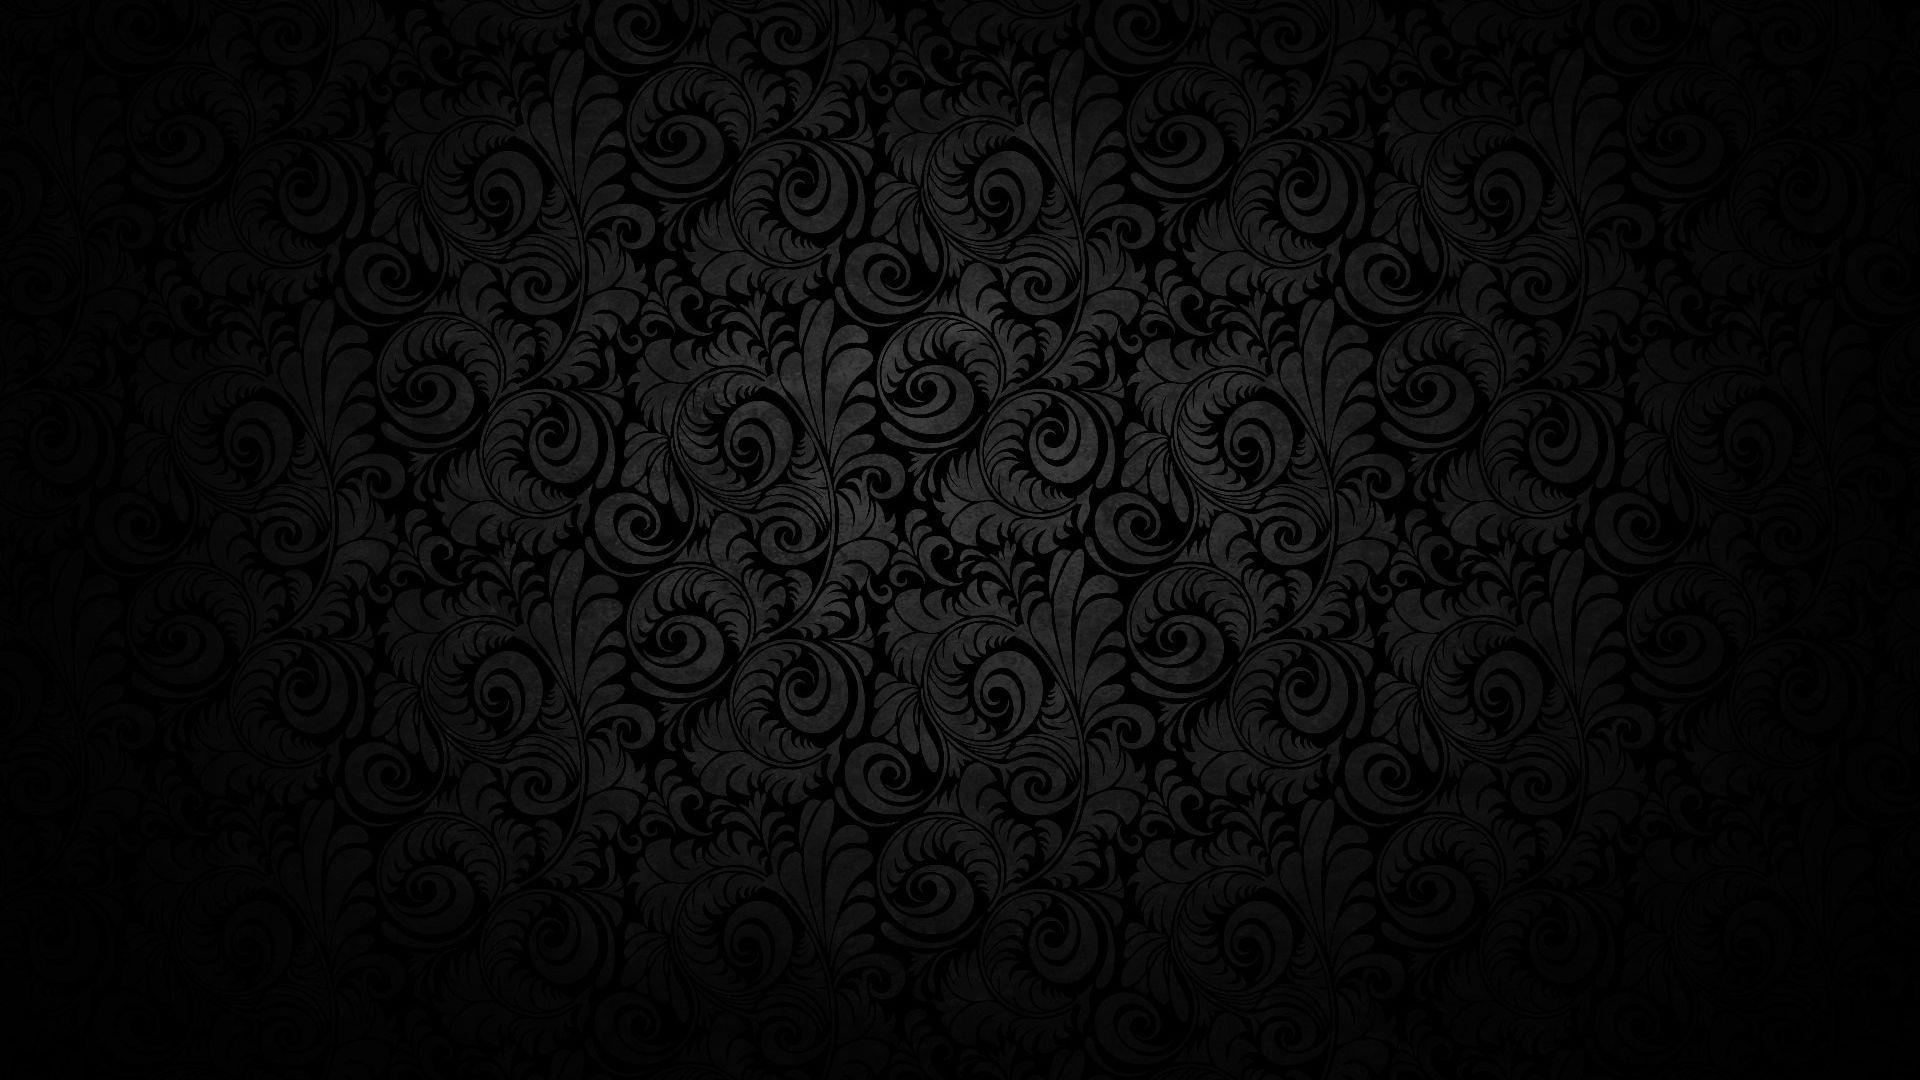 full hd 1080p textures wallpapers, desktop backgrounds hd | hình nền